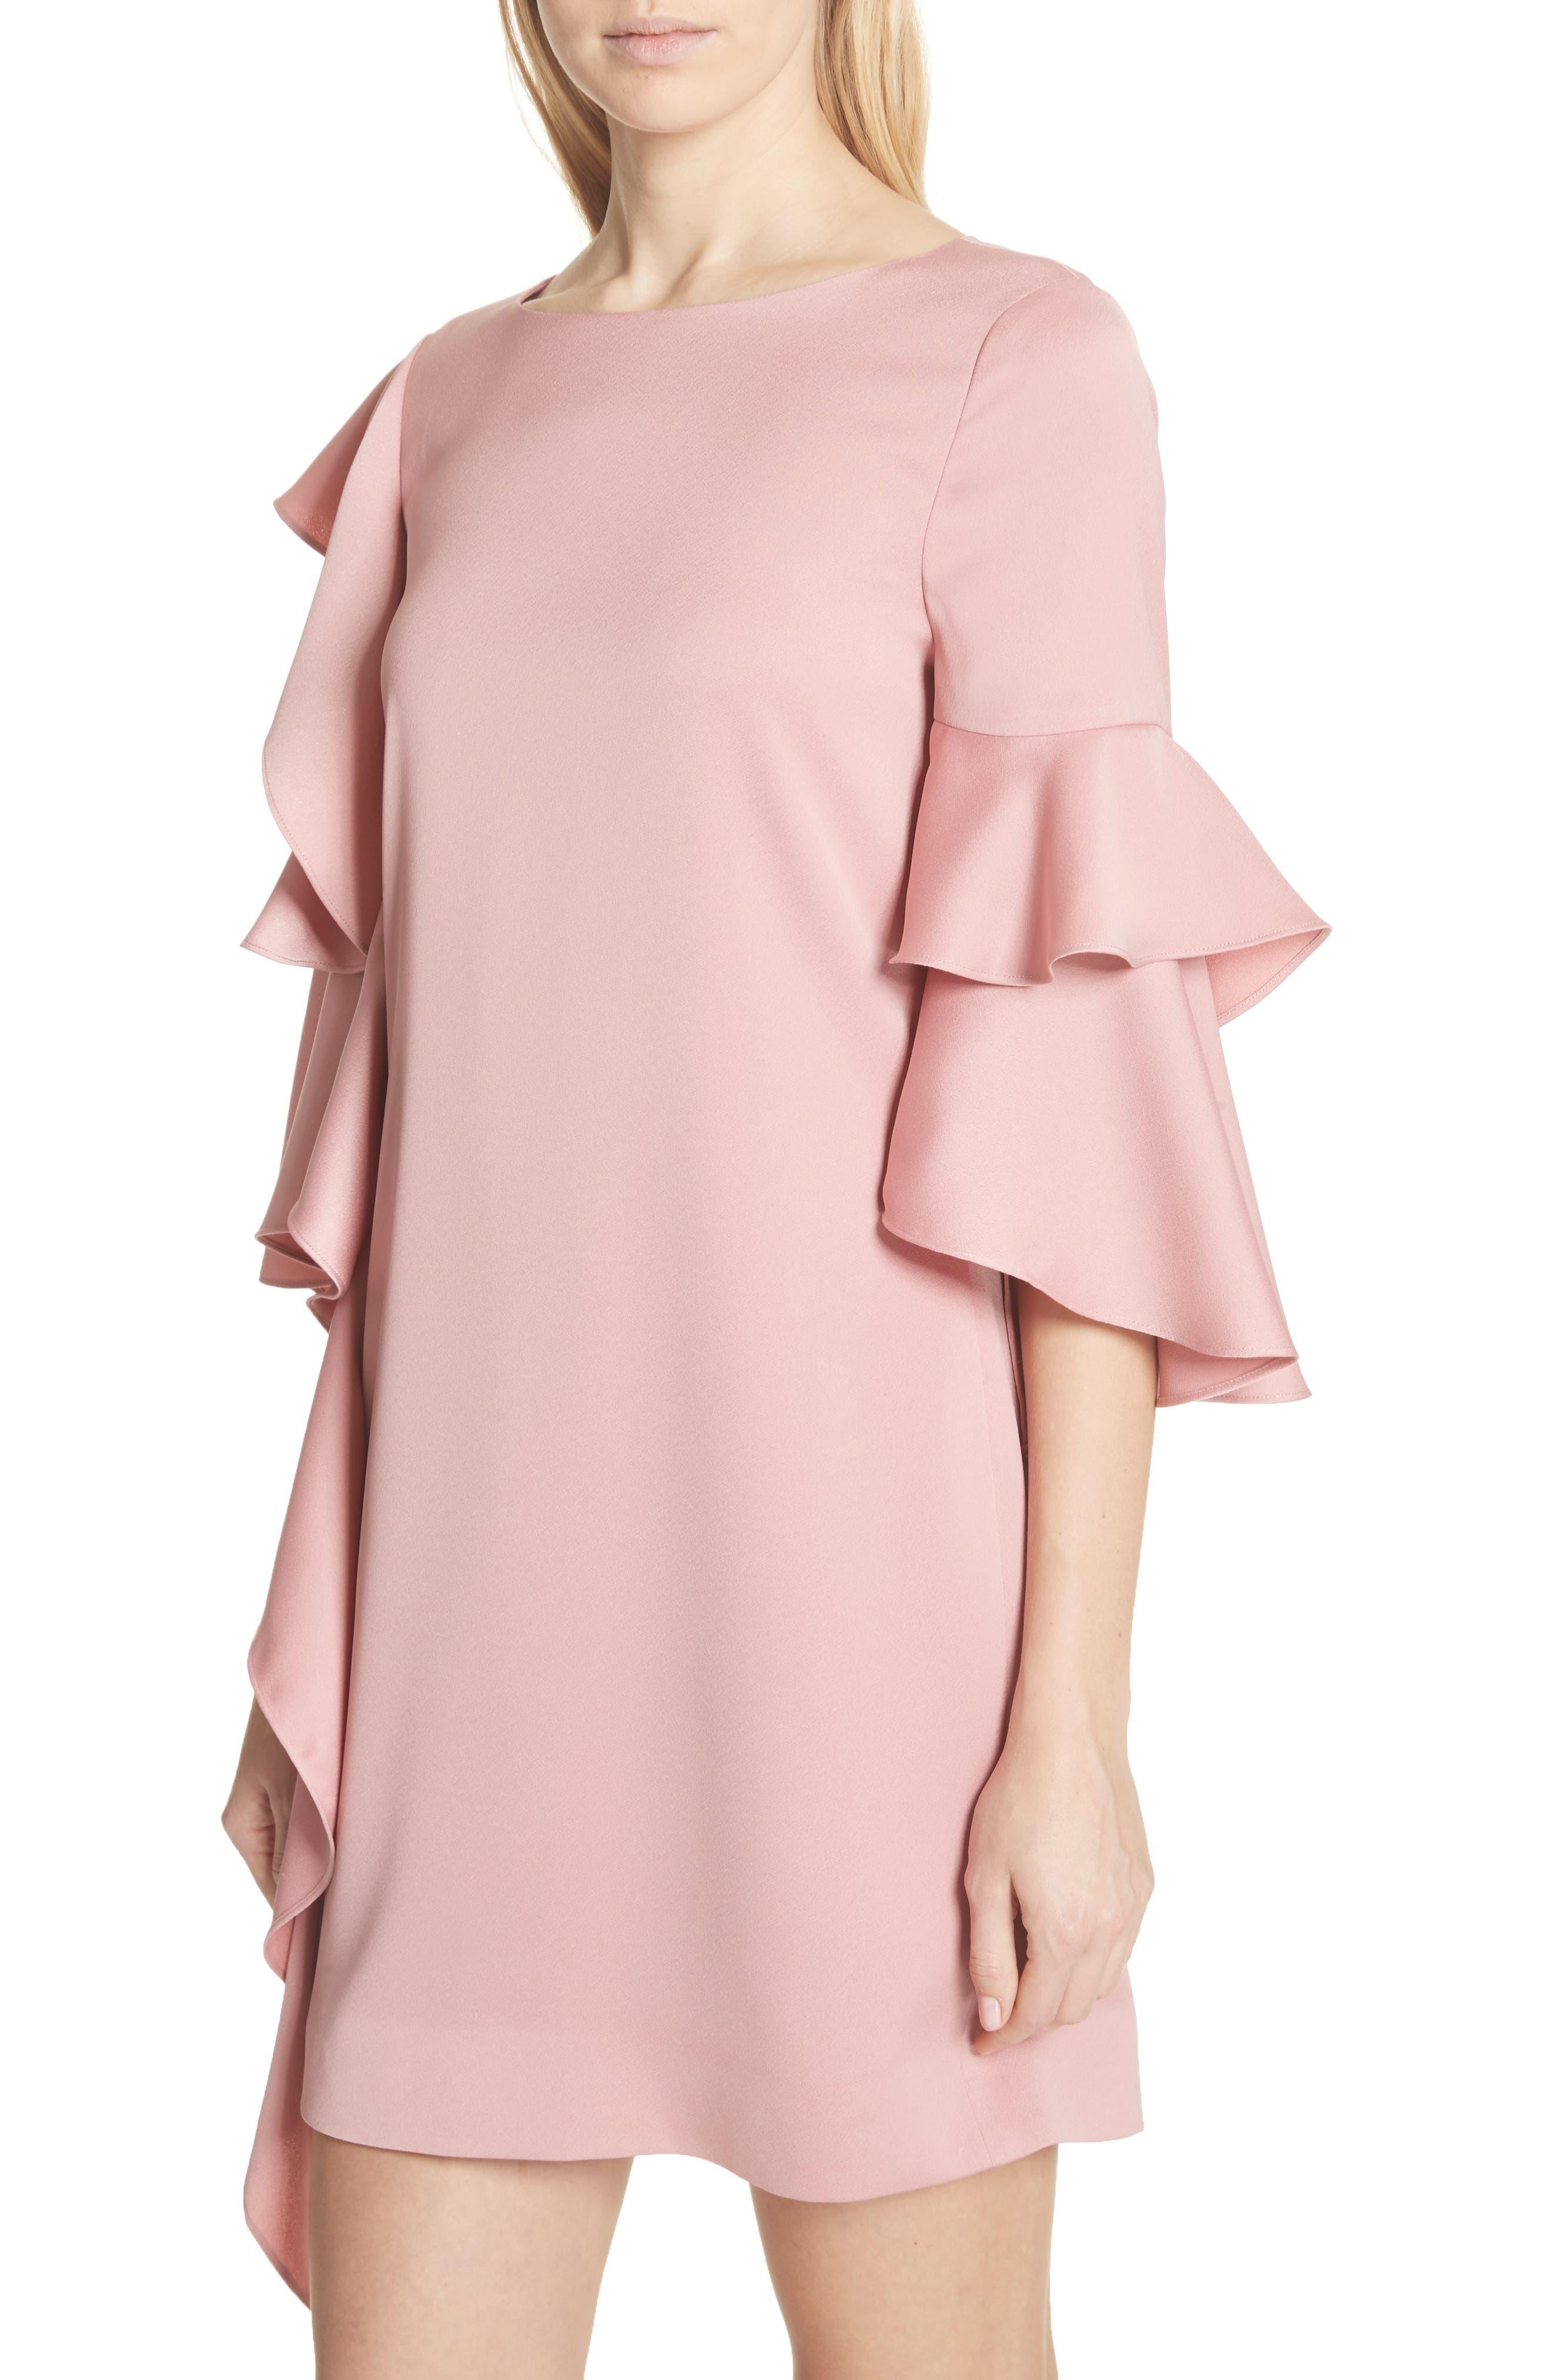 Ruffle Tunic Dress,                             Alternate thumbnail 4, color,                             660